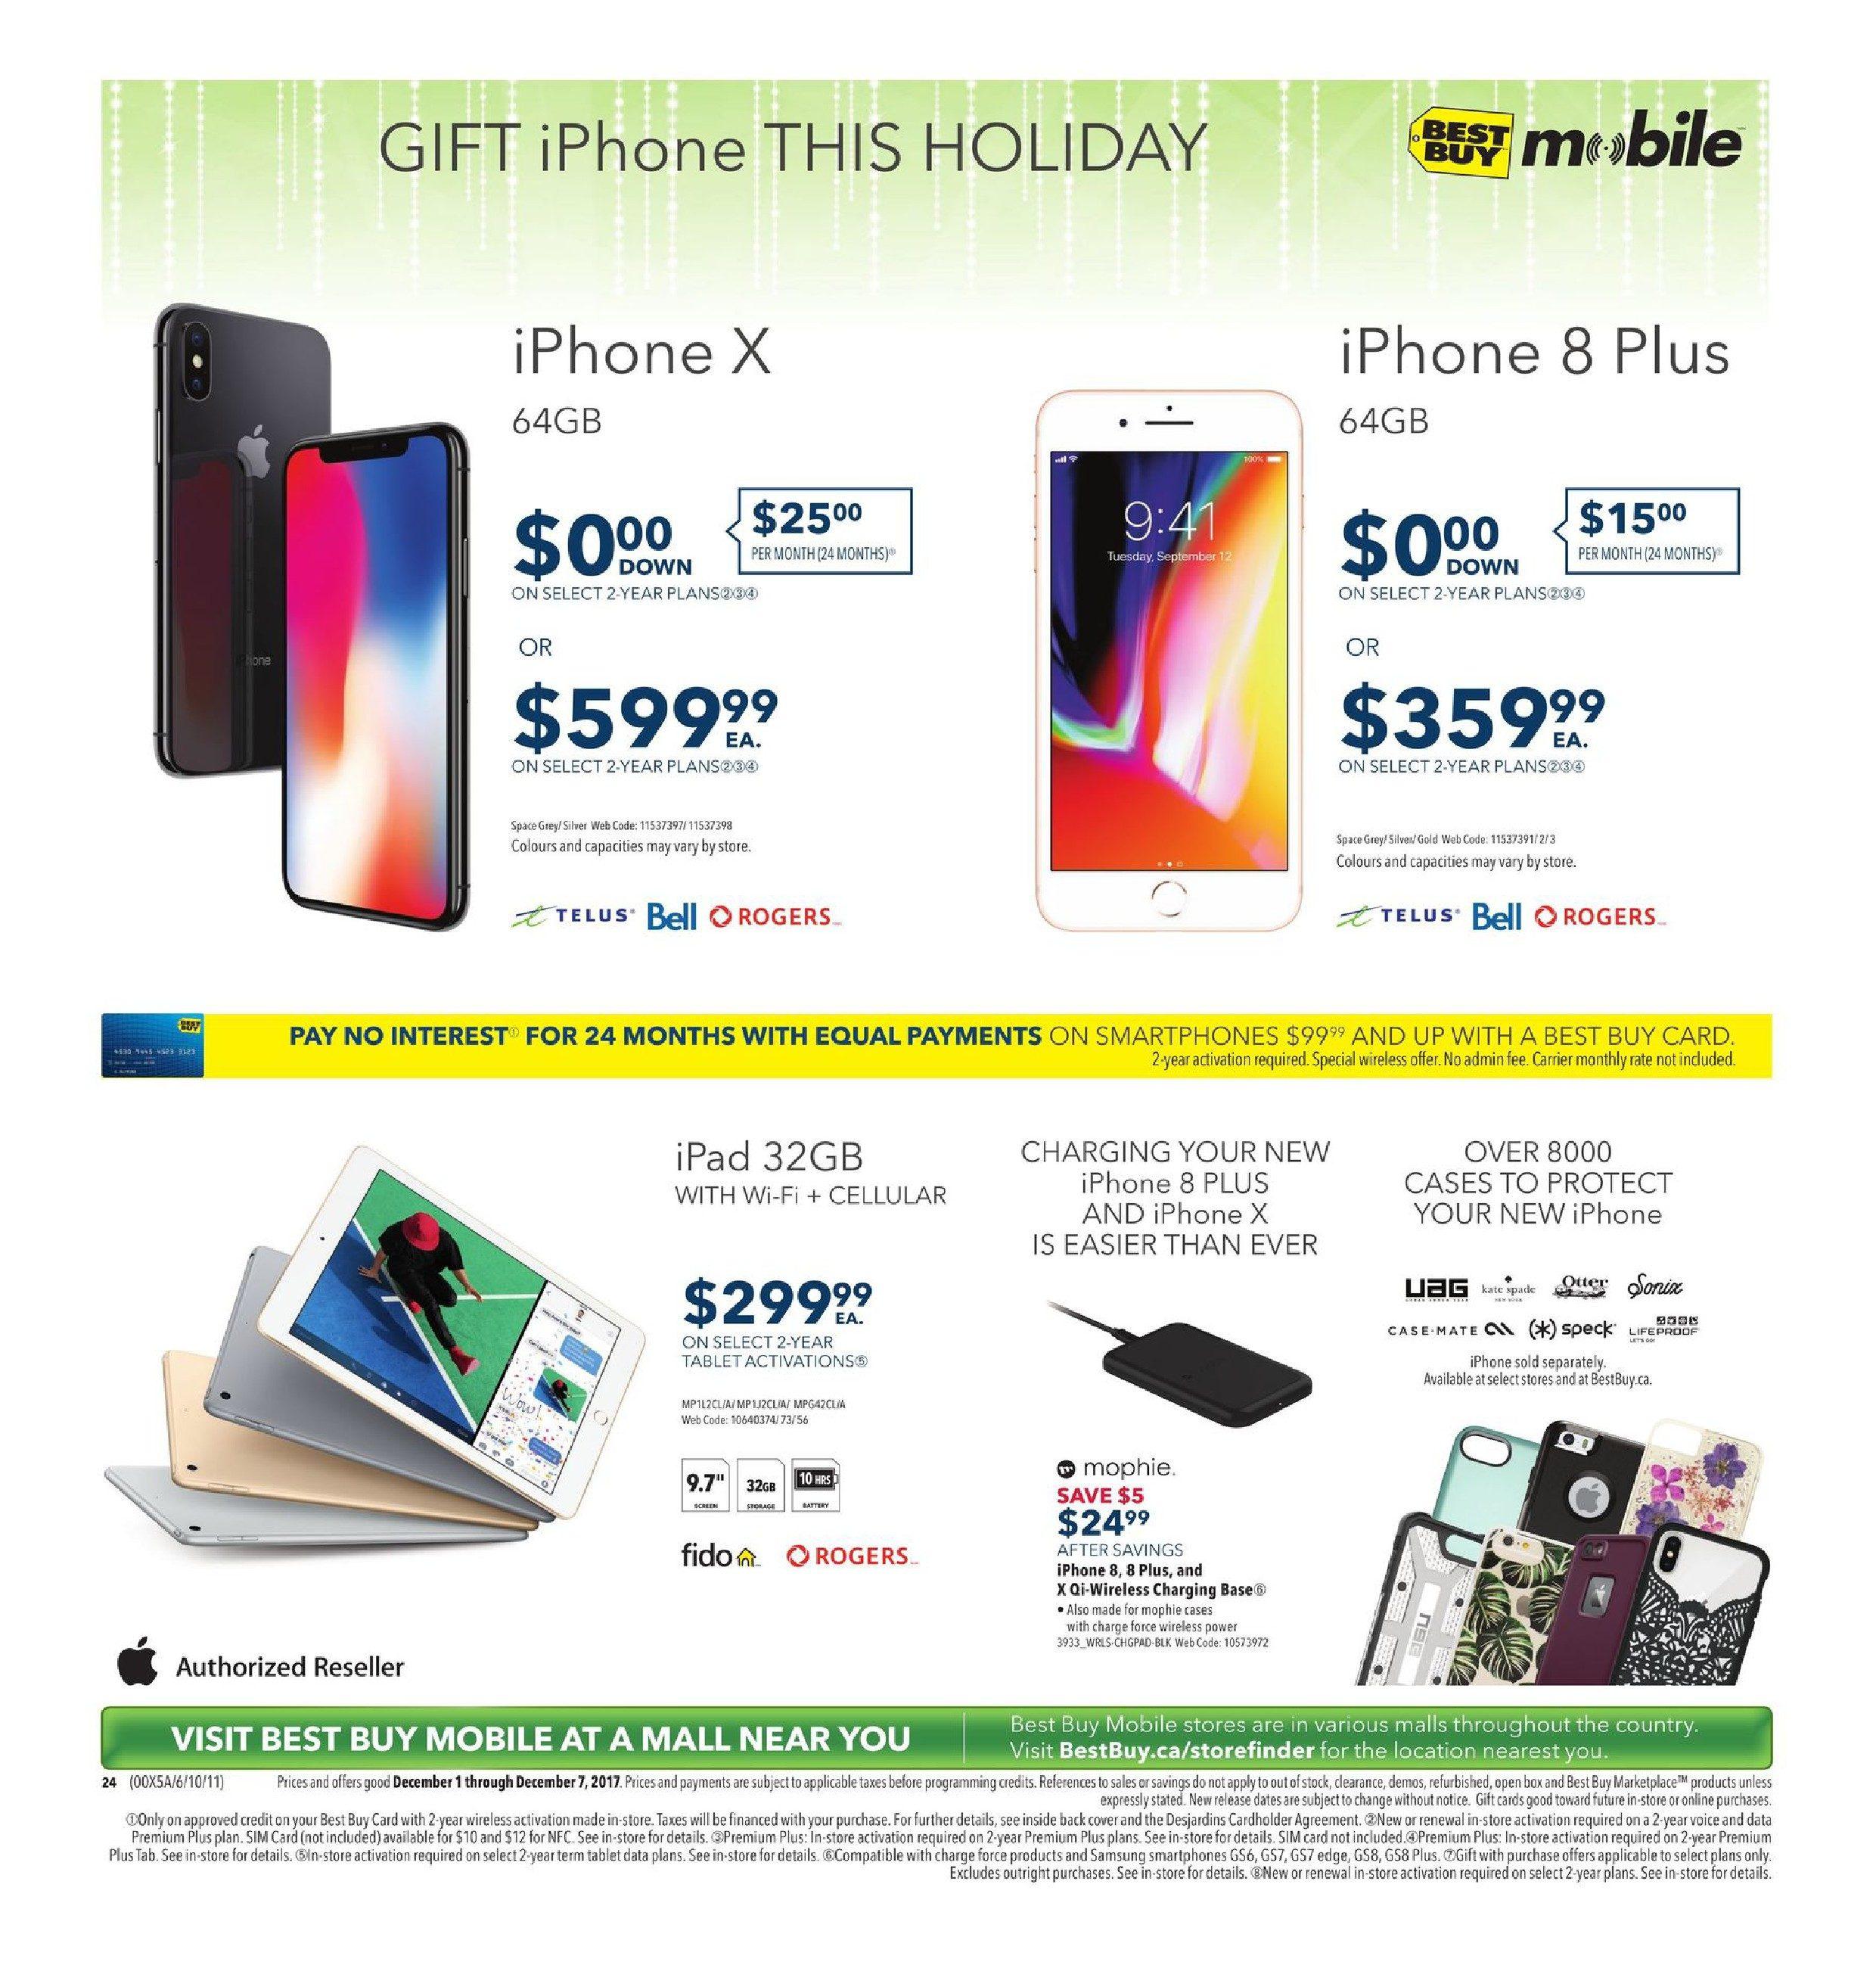 Best Buy Weekly Flyer - Weekly - Find Dazzling Gifts - Dec 1